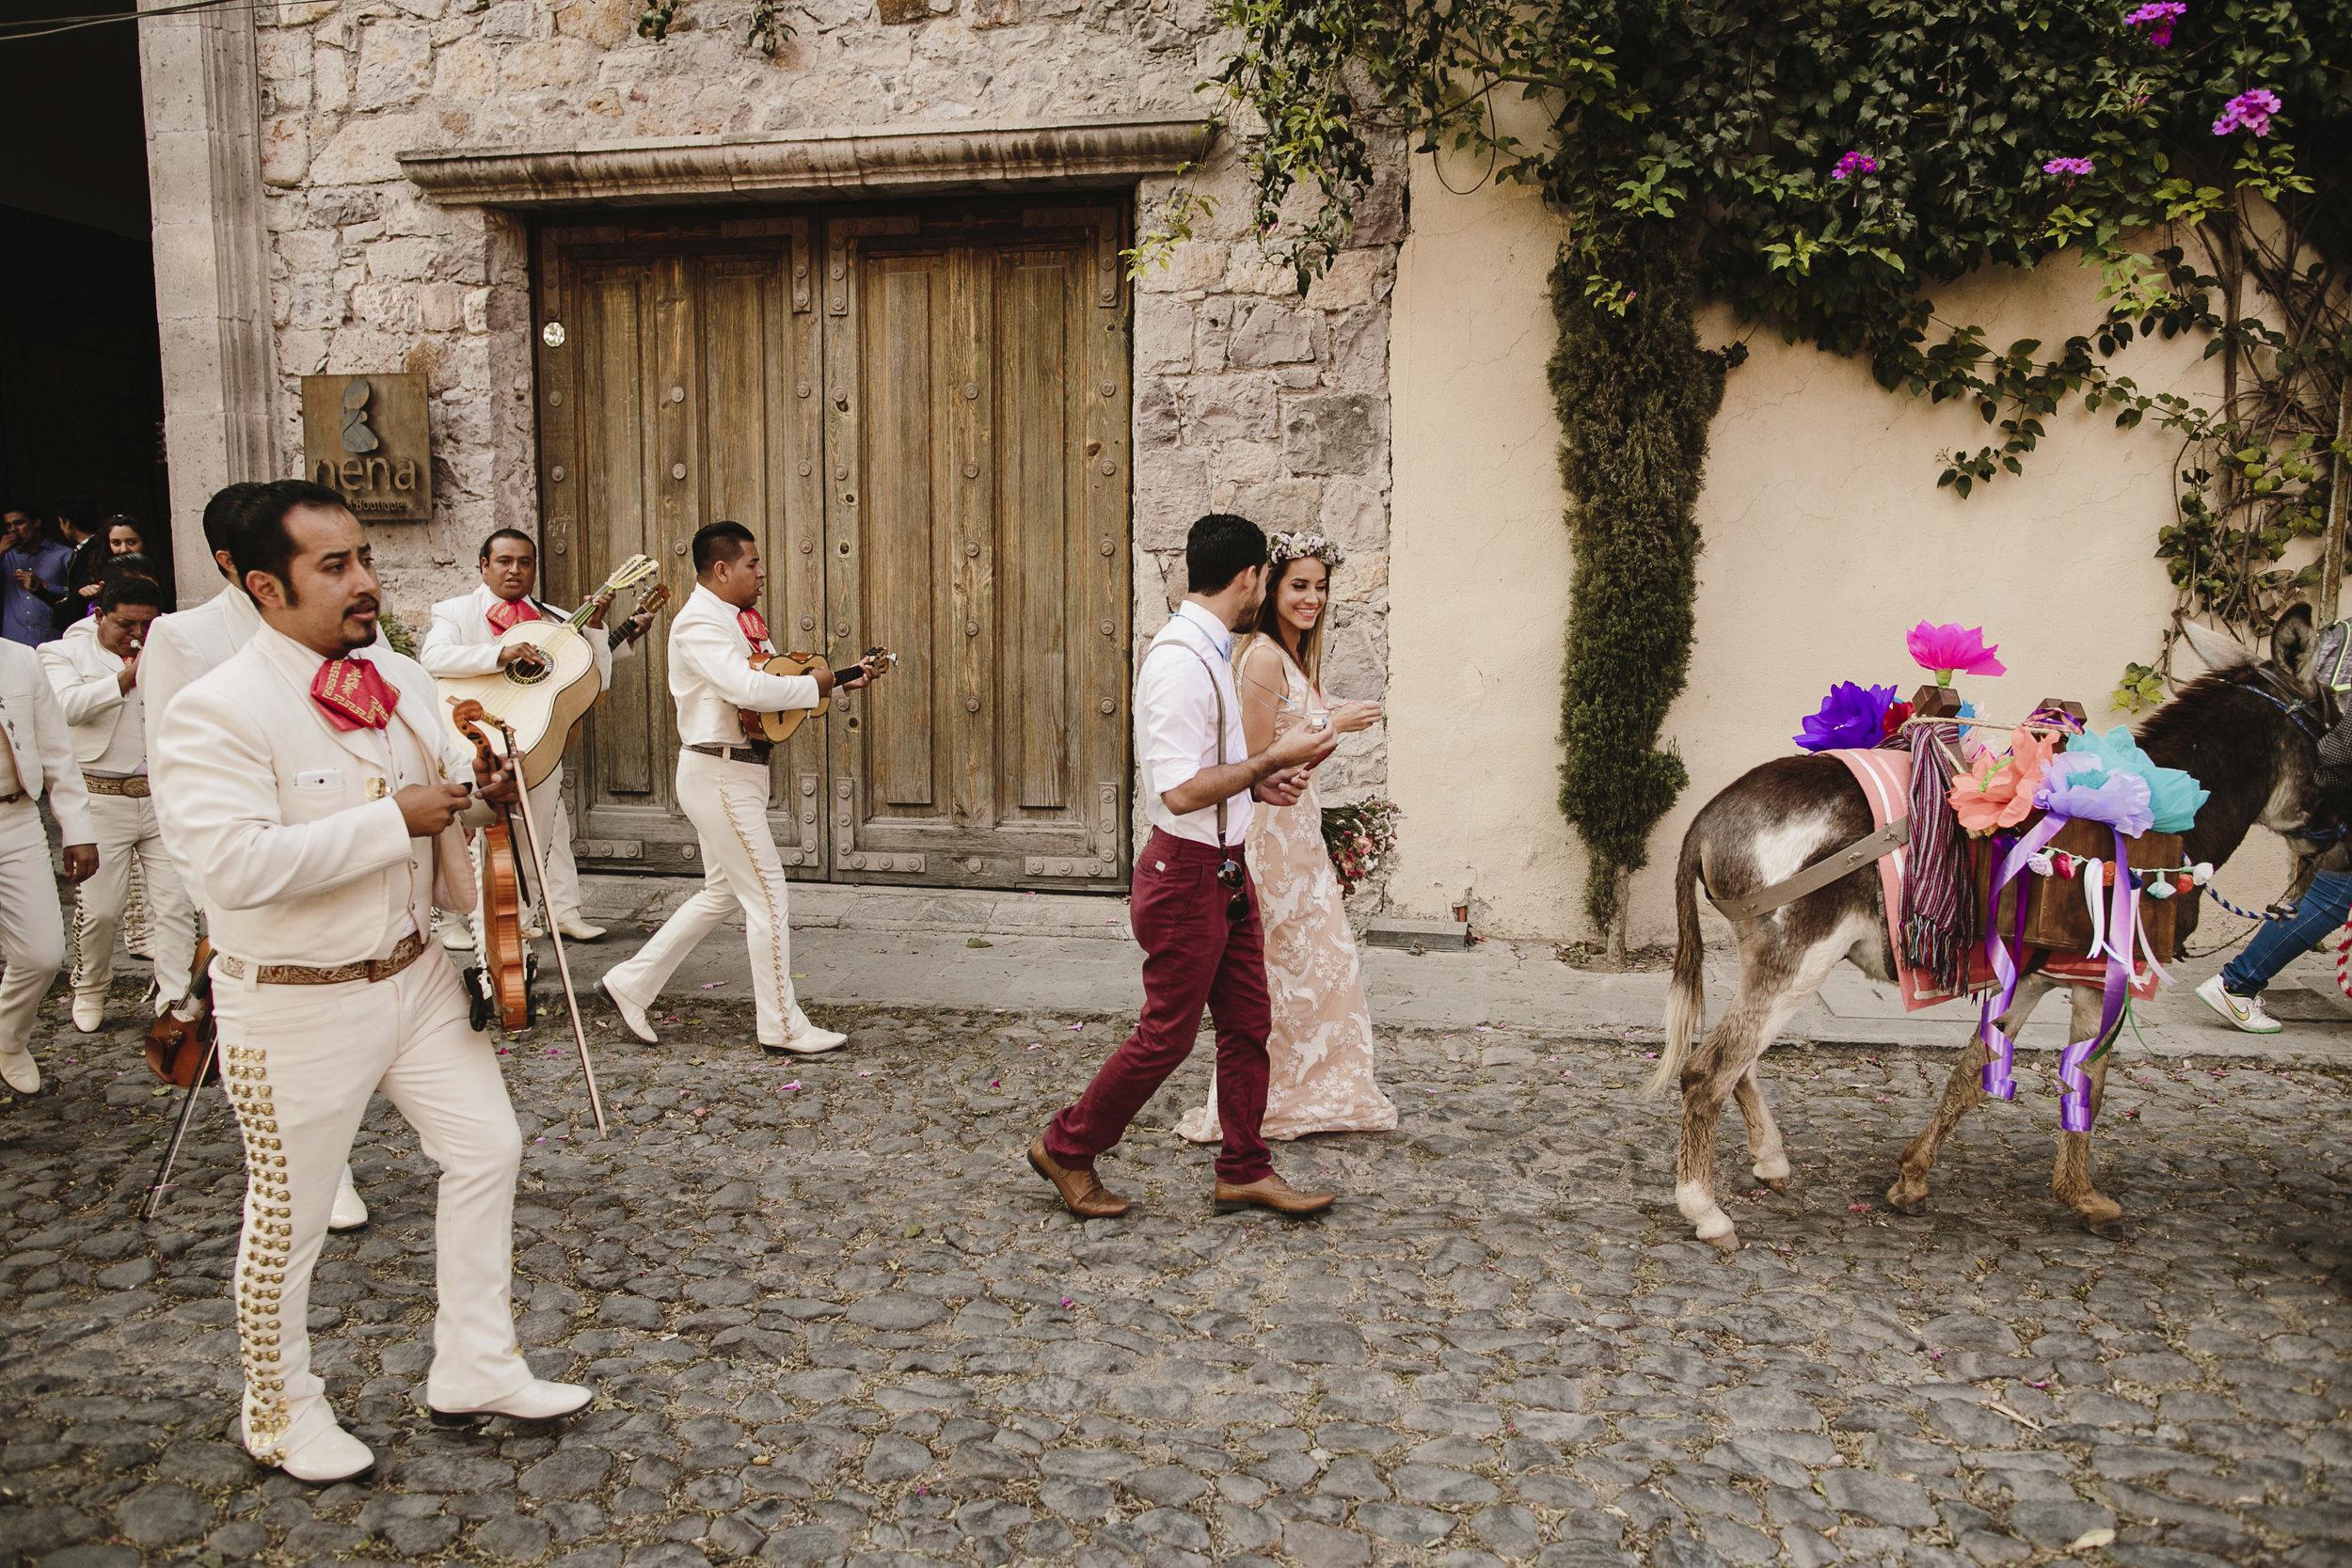 alfons_flores_destination_wedding_photography_mavi_david-284.JPG